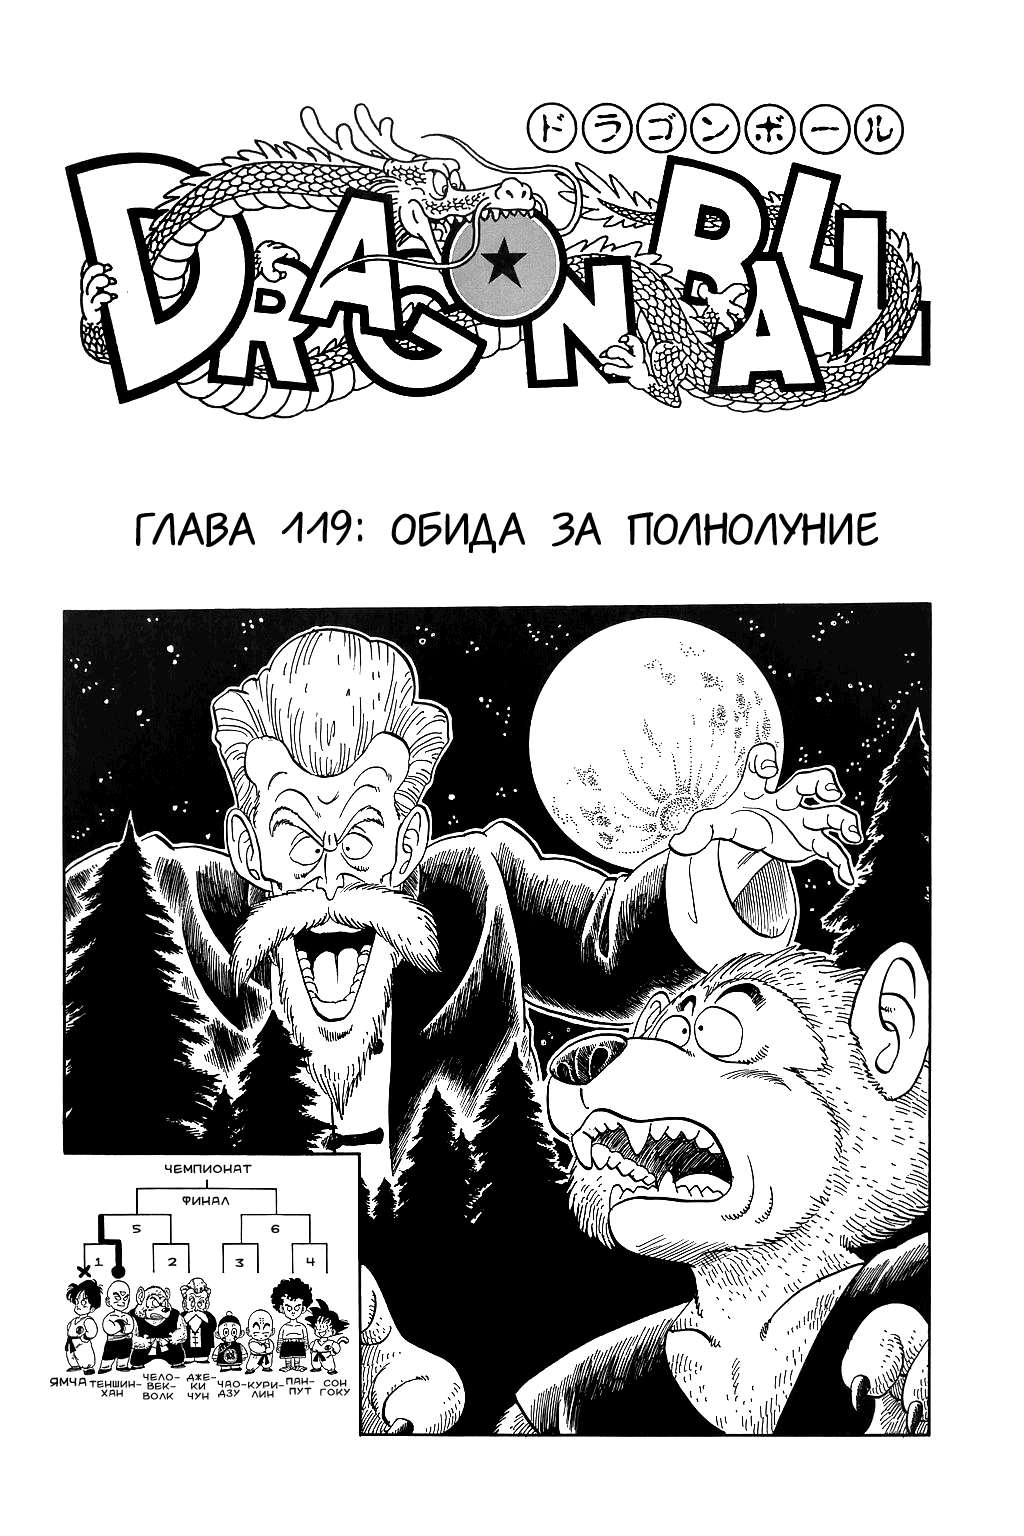 Драгон Болл (Канзенбан) 8 - 119 Обида за полнолуние